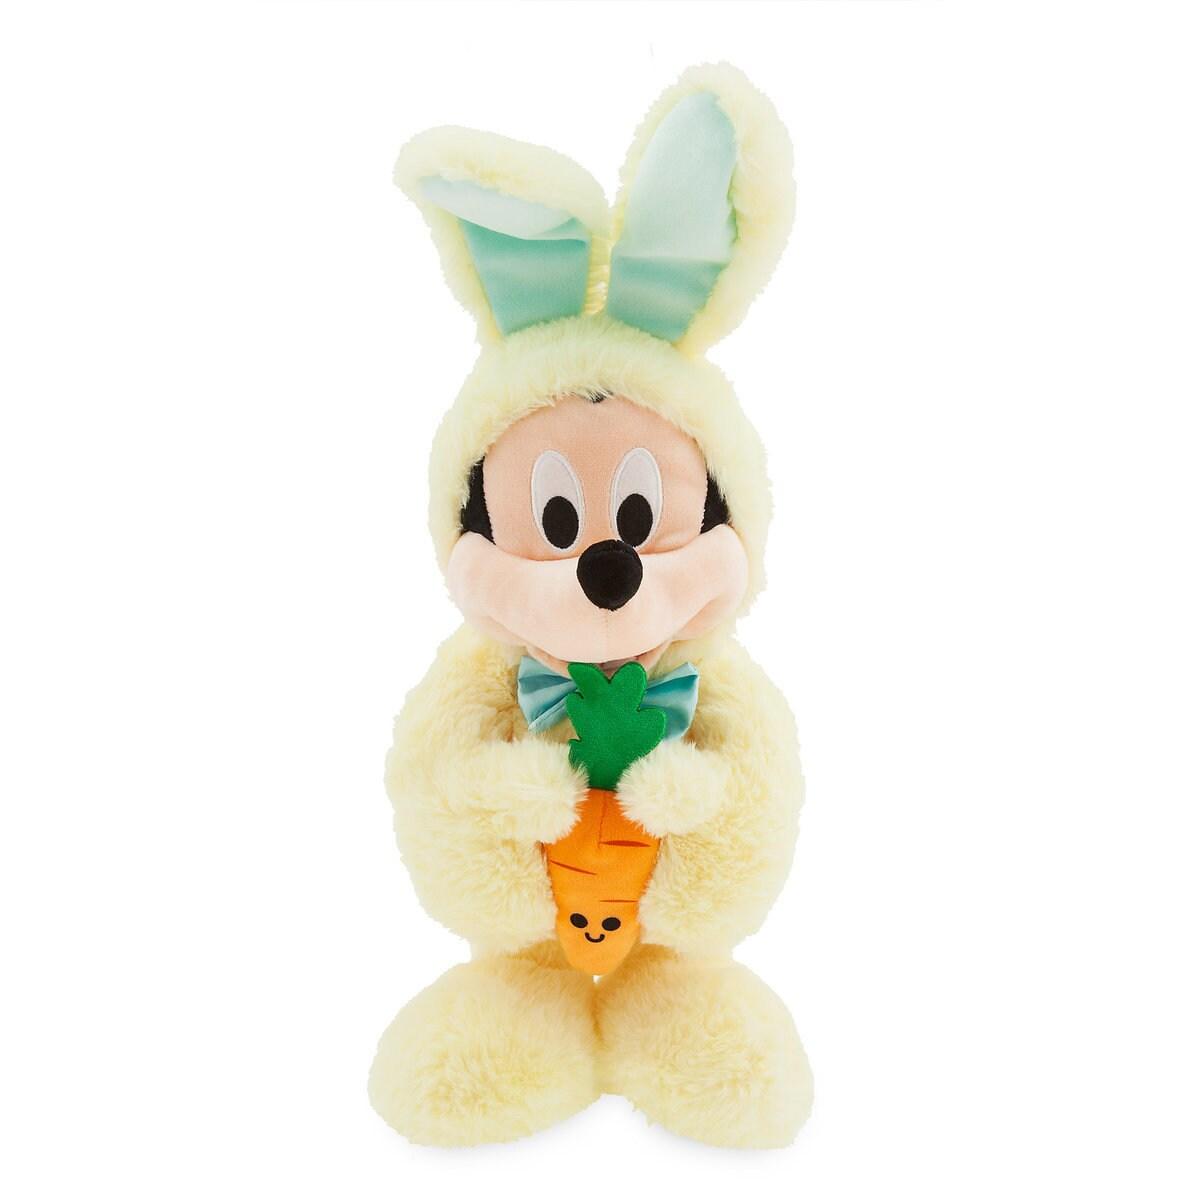 03c985e2b Product Image of Mickey Mouse Plush Bunny 2019 - Medium - 18'' -  Personalized